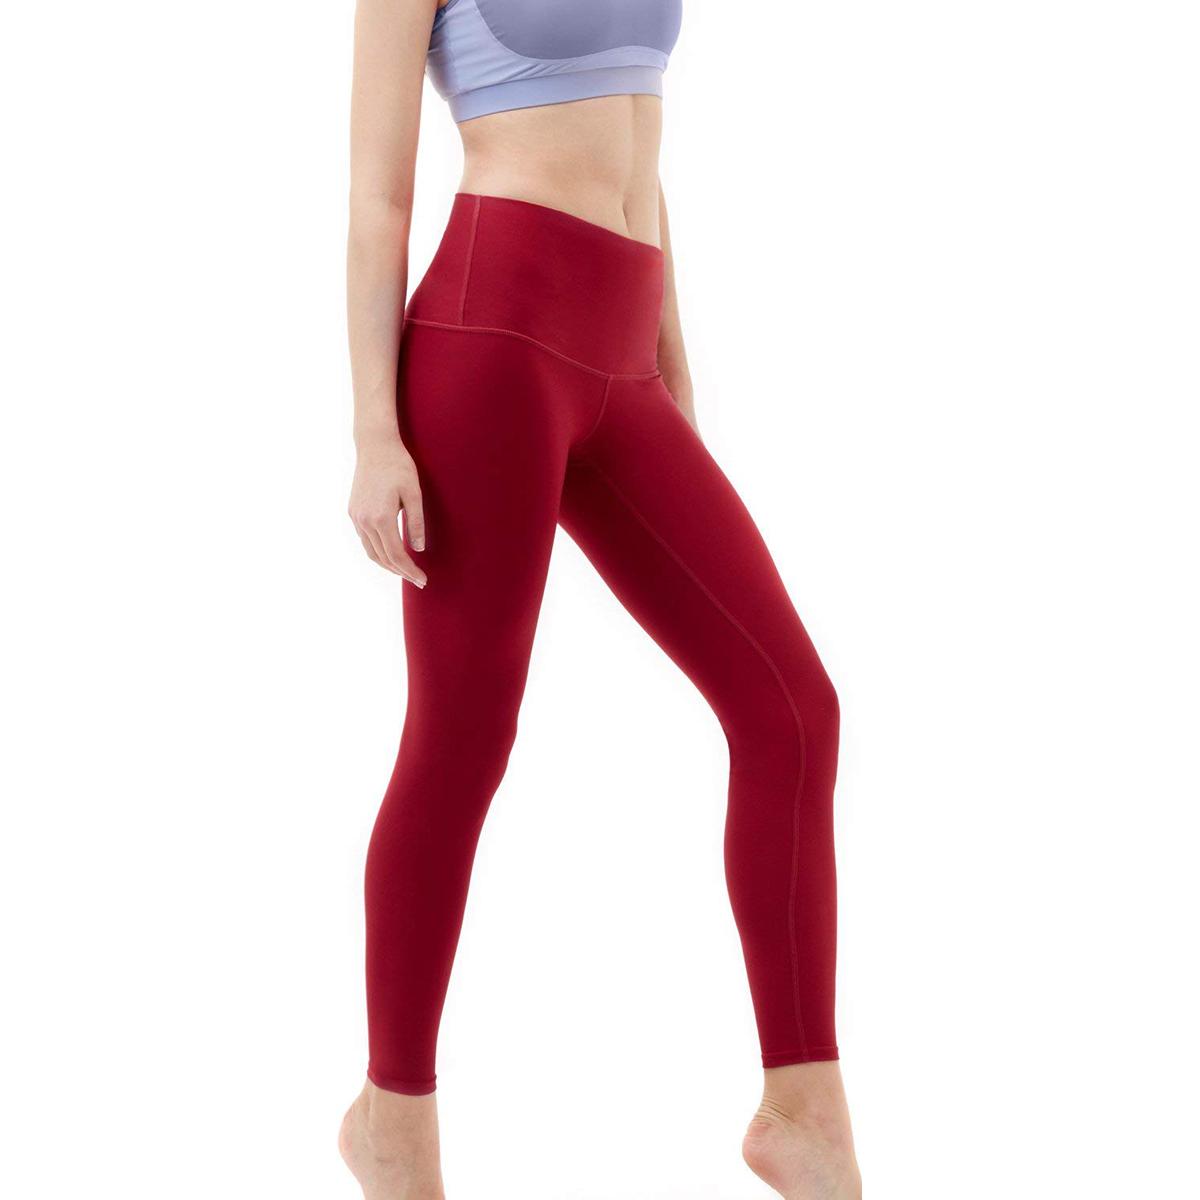 thumbnail 30 - TSLA Tesla FYP52 Women's High-Waisted Ultra-Stretch Tummy Control Yoga Pants